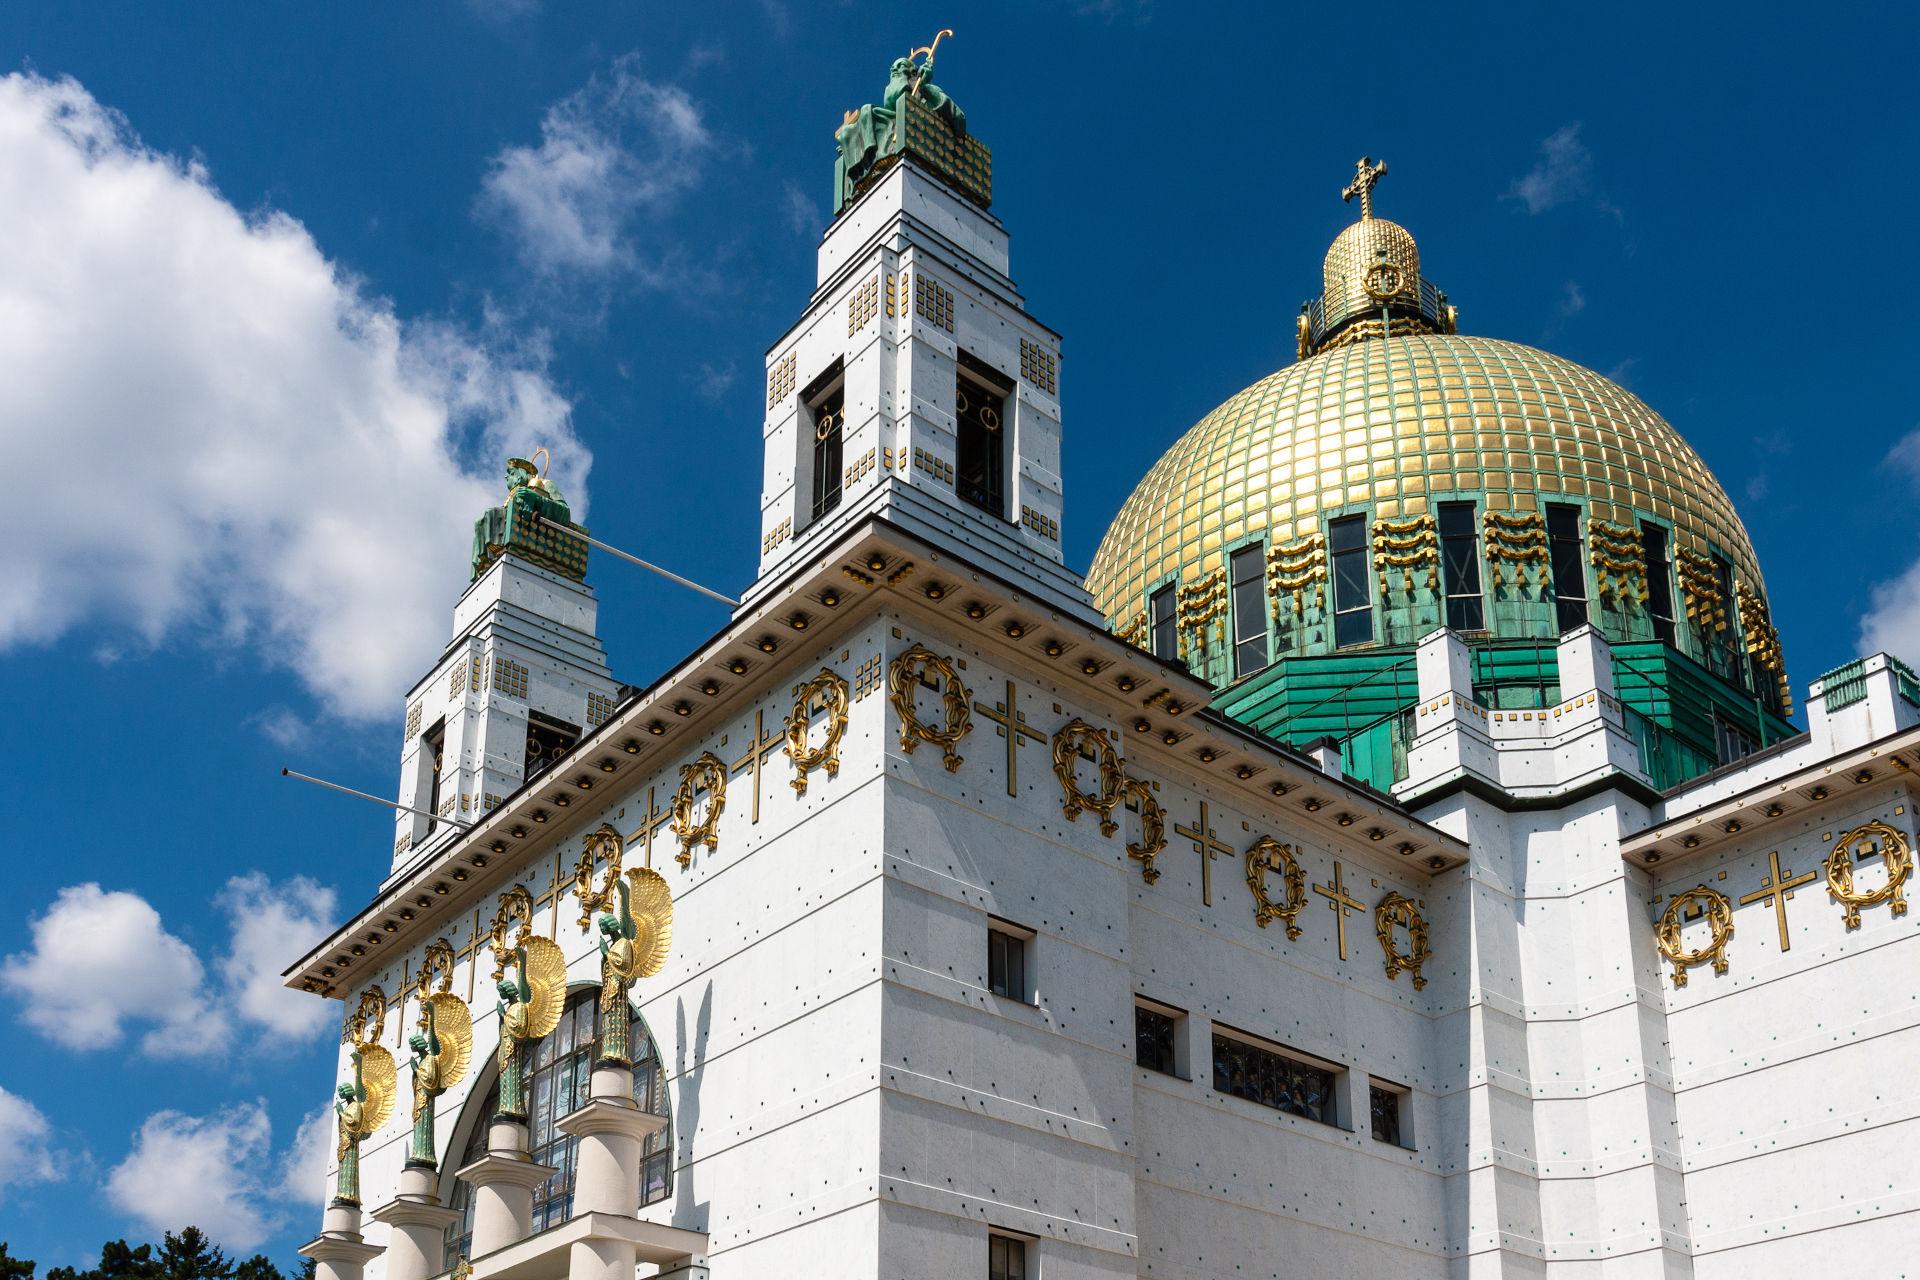 vergoldete Kuppel der Kirche am Steinhof